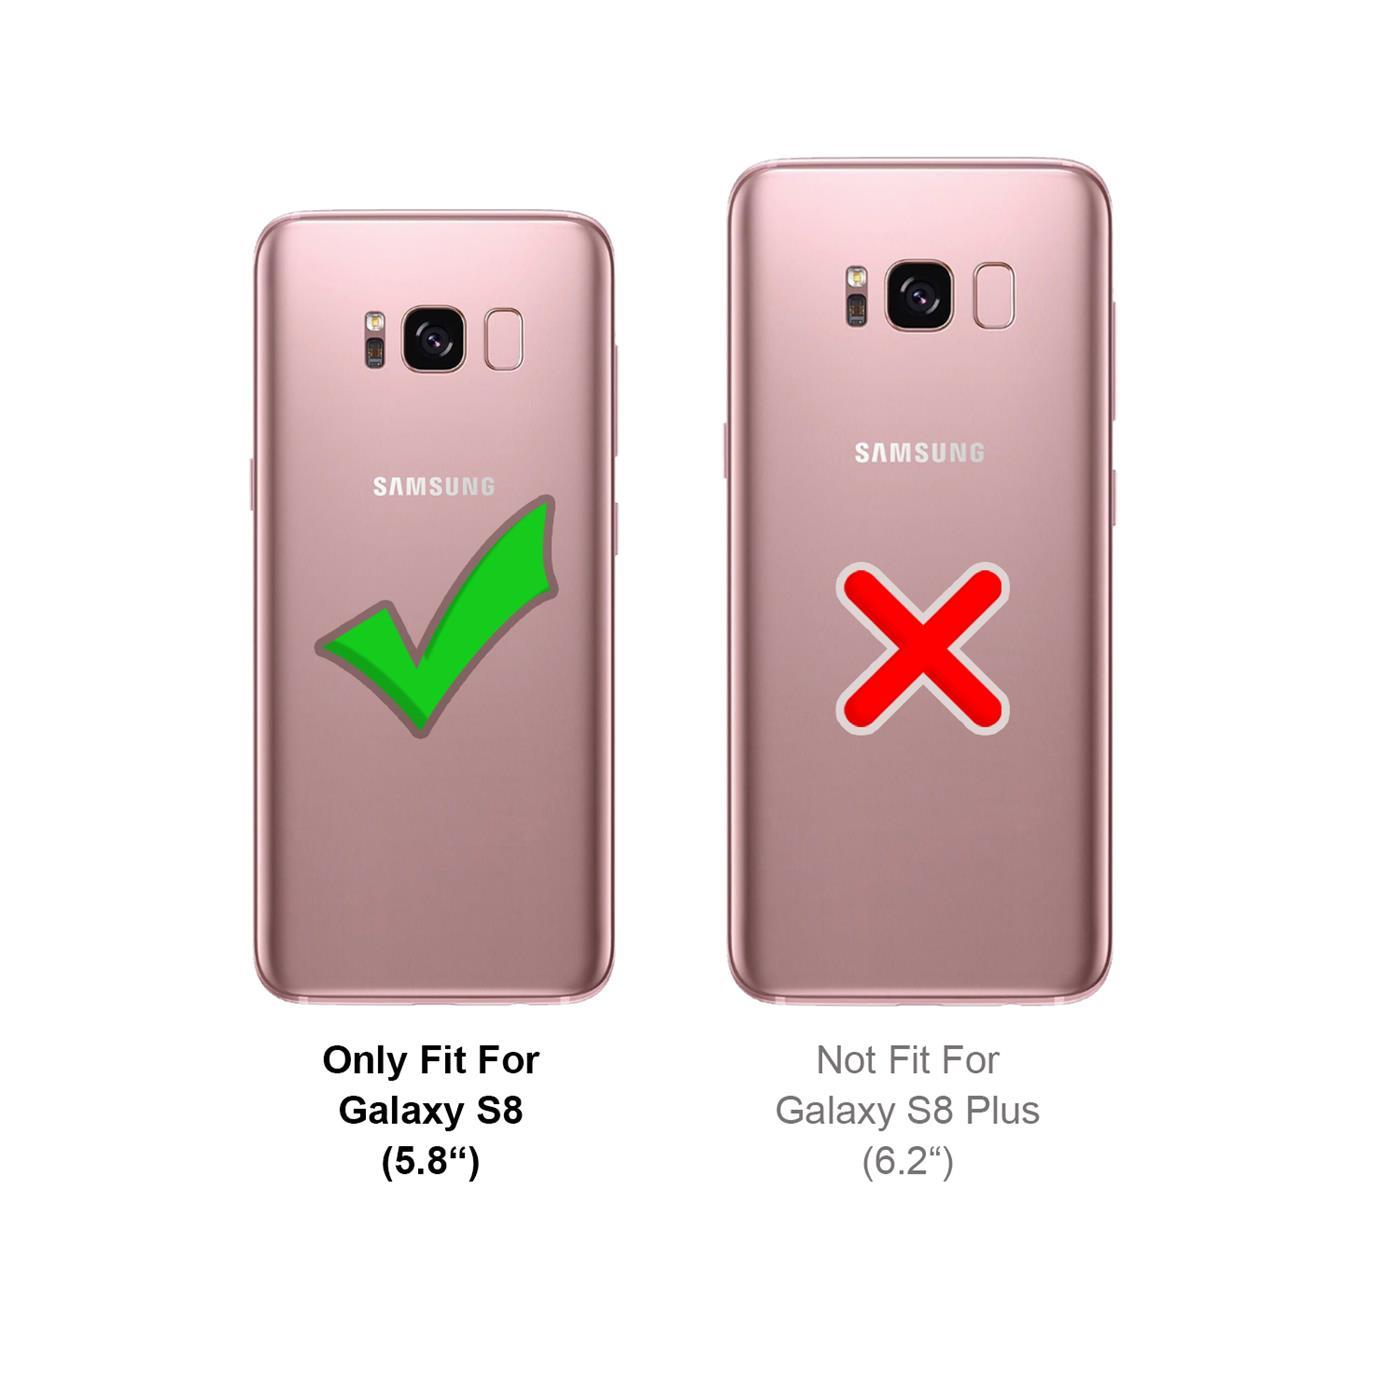 Hard-Back-Case-Cover-Samsung-Galaxy-s4-duenn-Cover-Slim-Shockproof-Rugged Indexbild 19